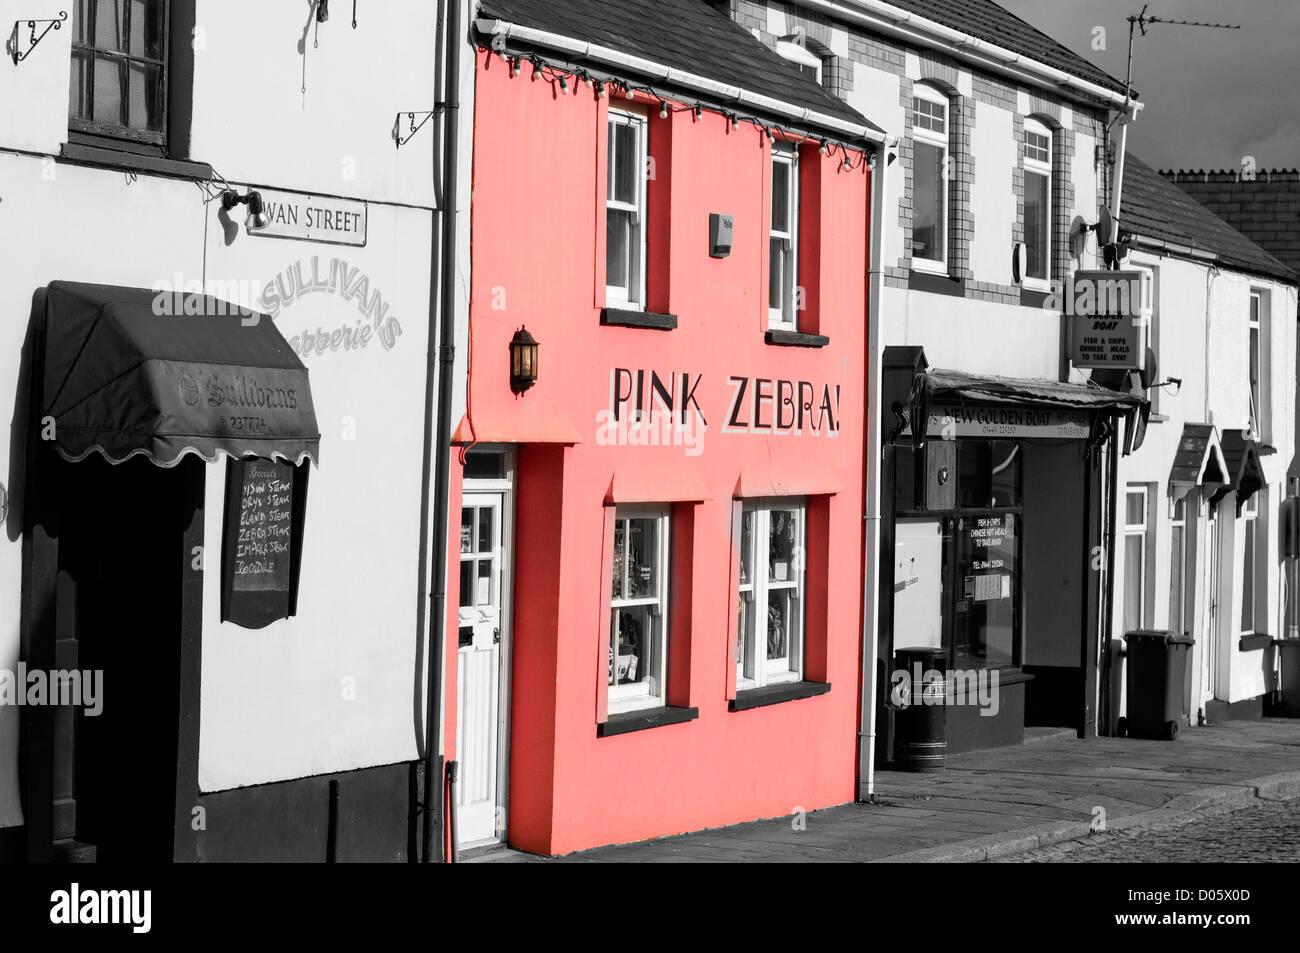 Zebra Shop Imágenes De Stock & Zebra Shop Fotos De Stock - Alamy